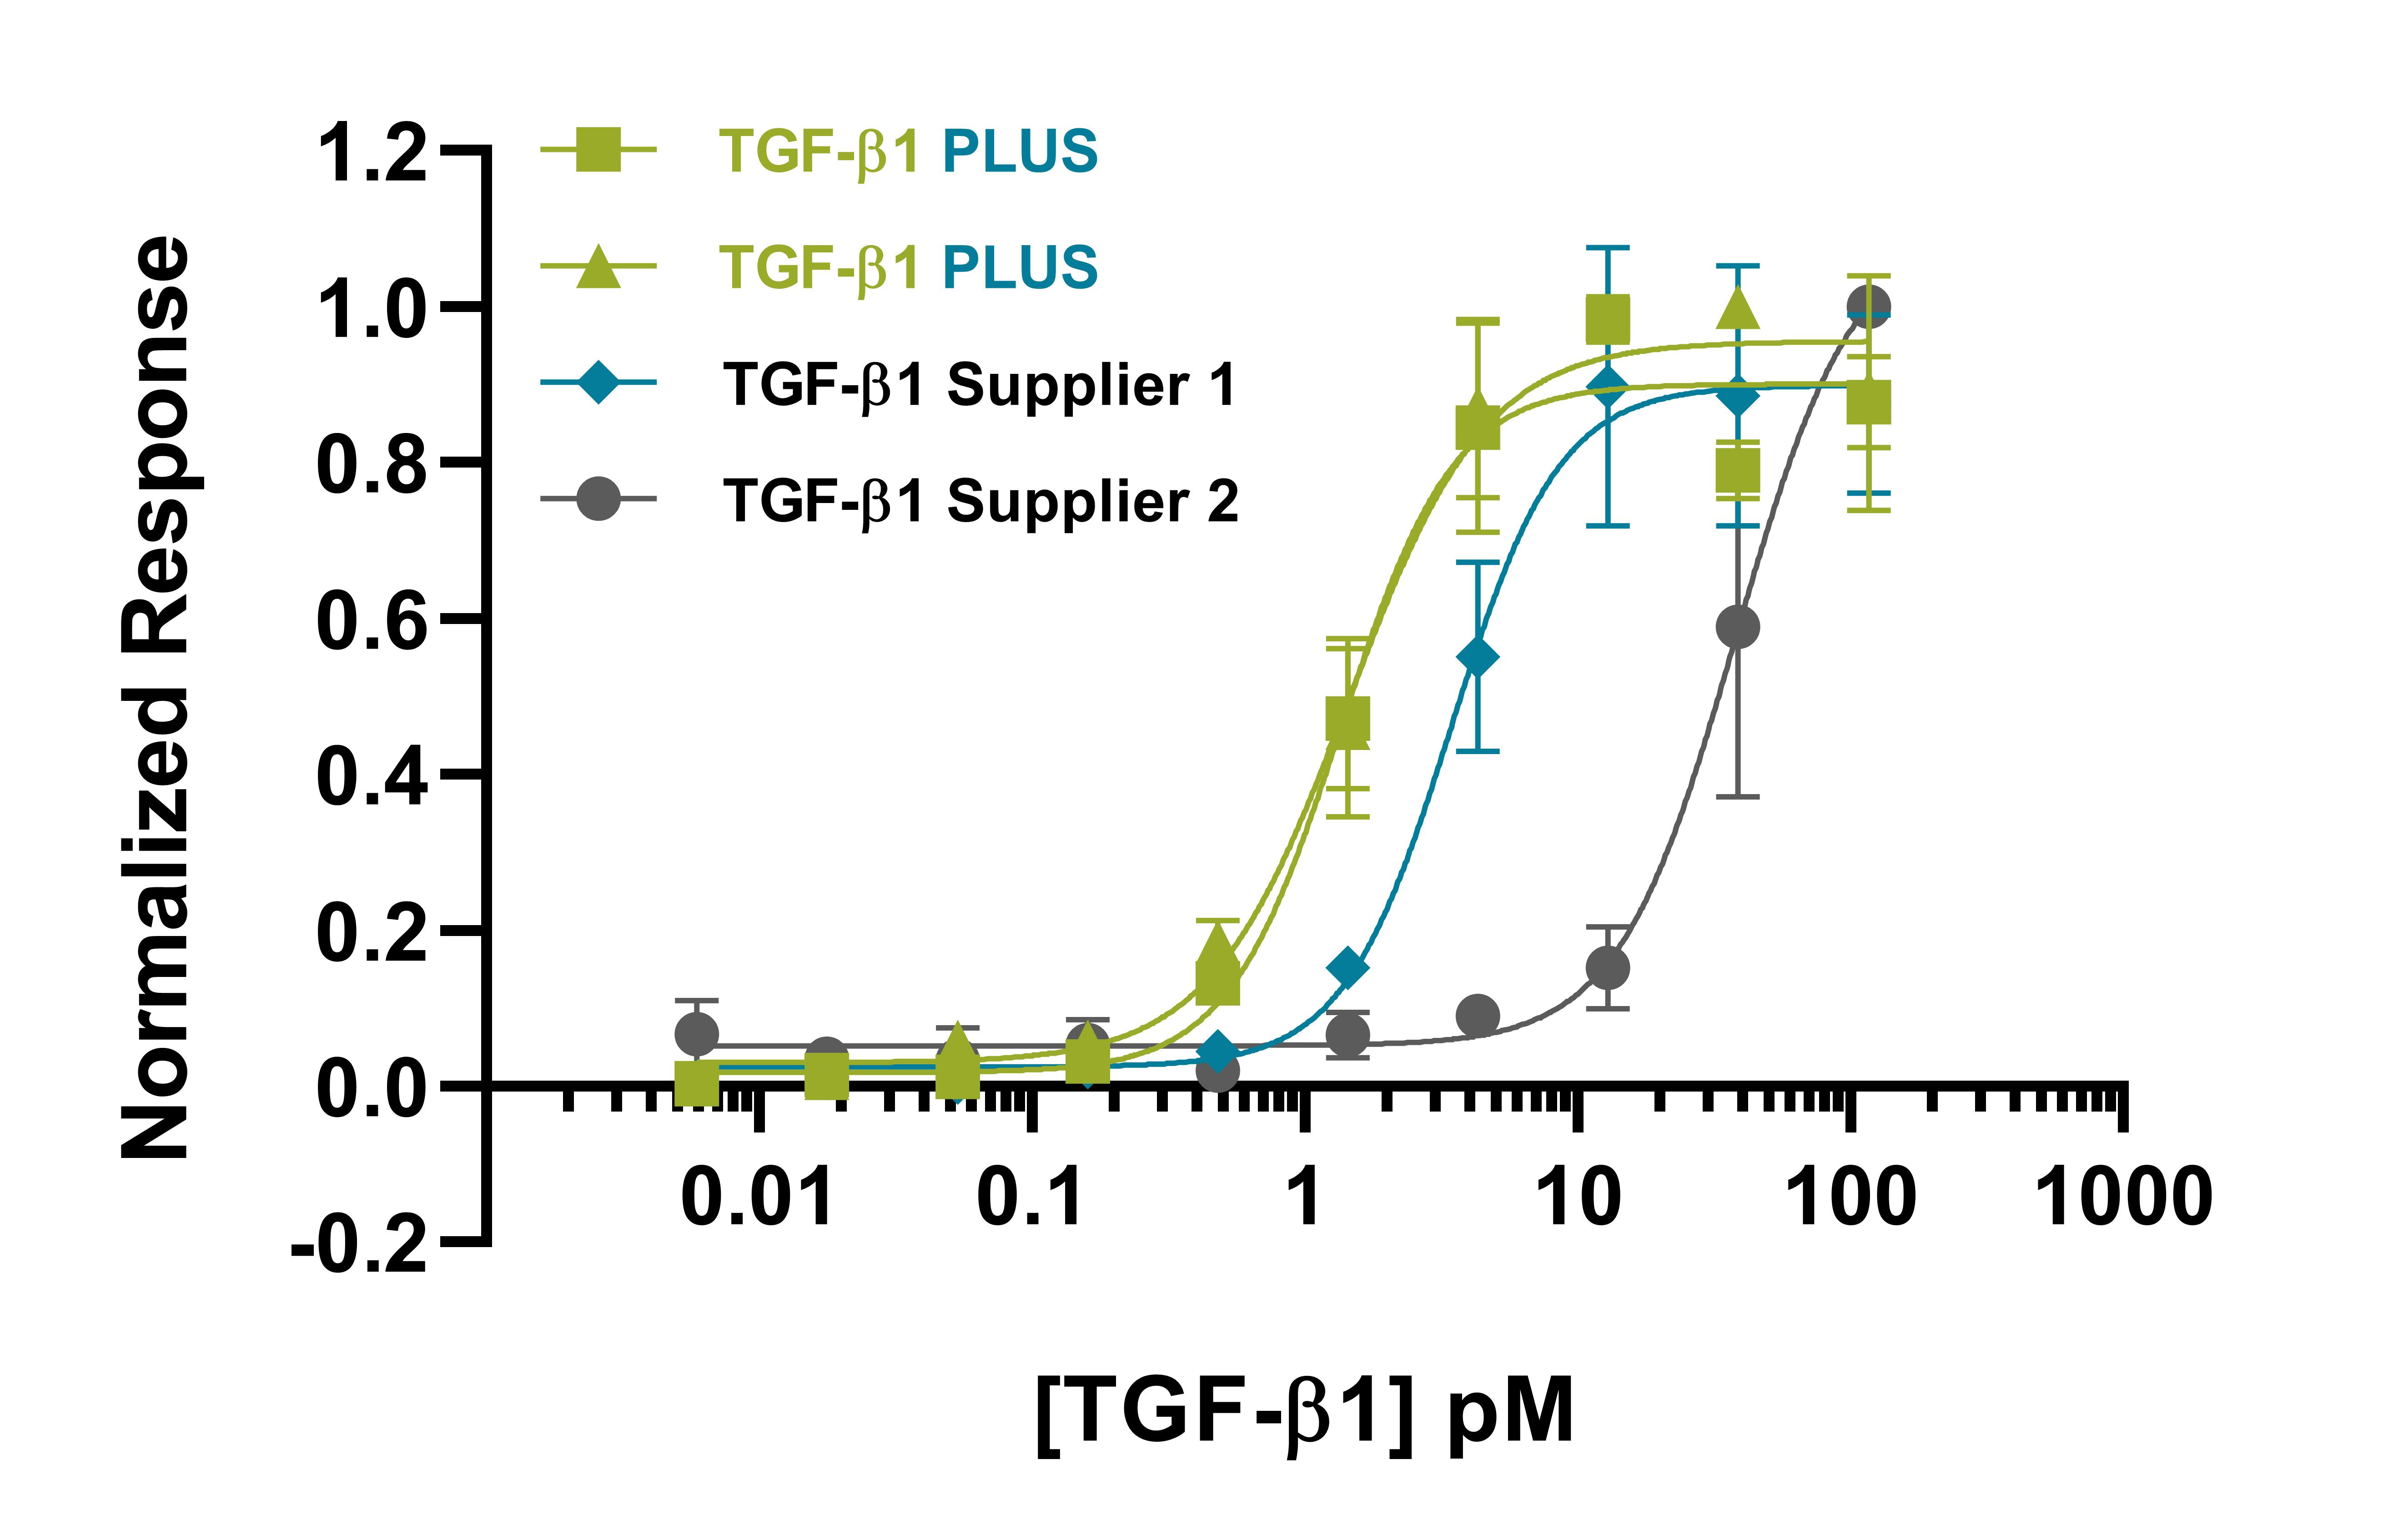 Recombinant human TGF β1 PLUS protein bioactivity